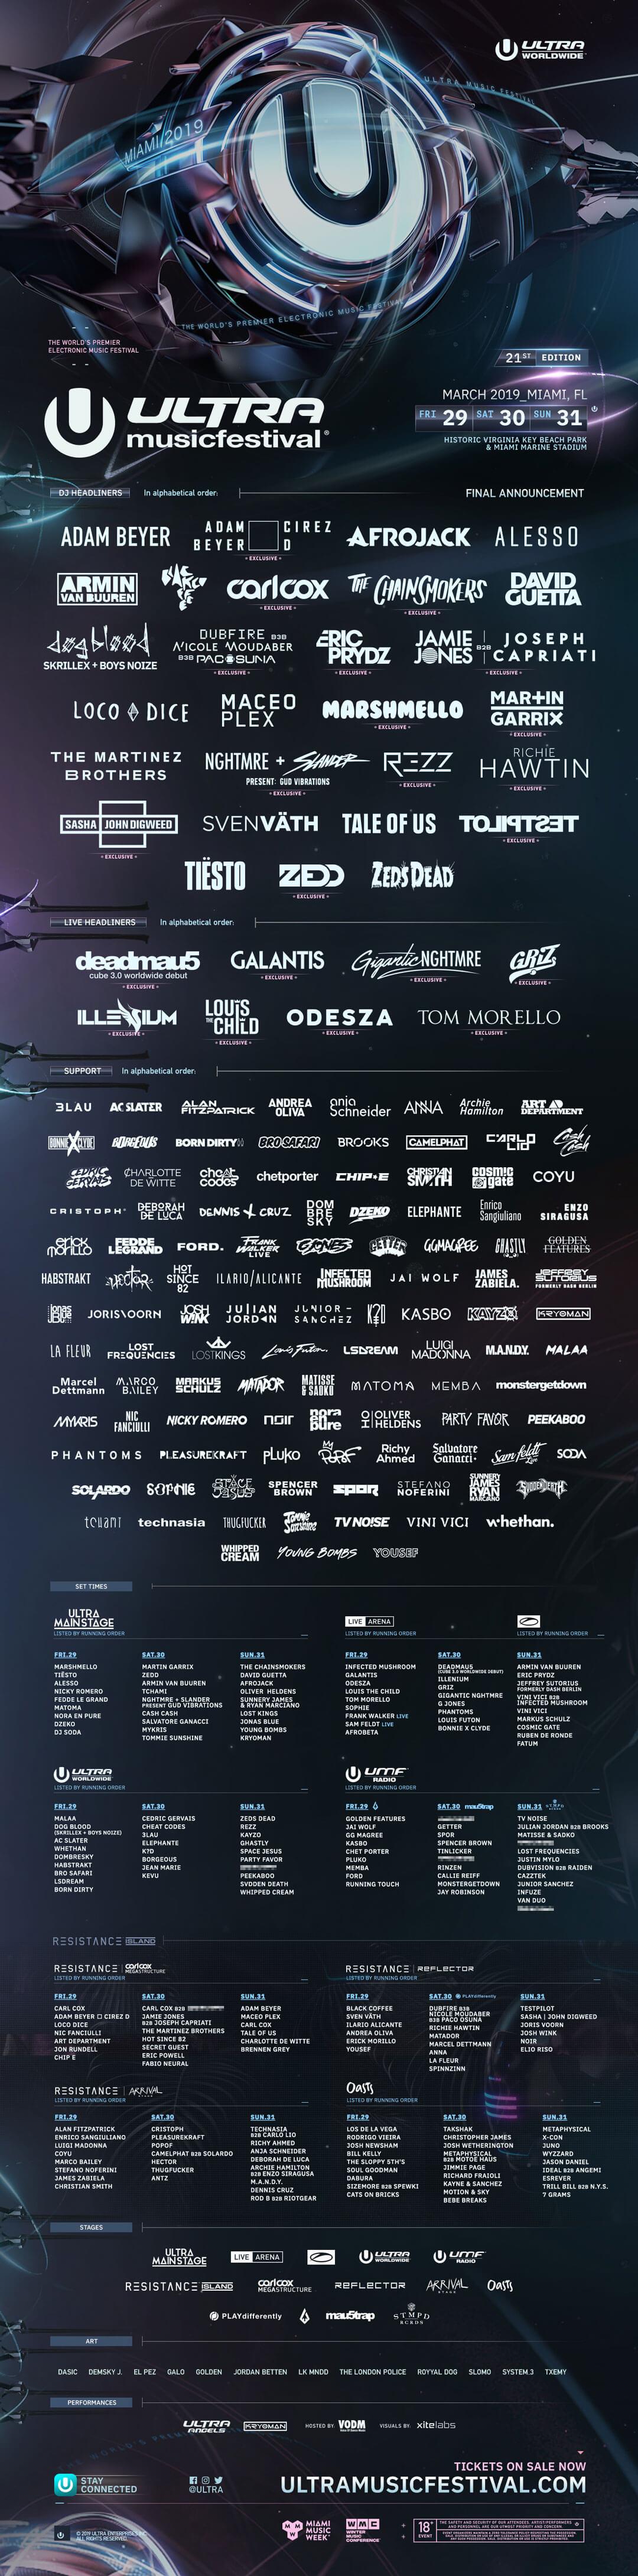 Ultra Music Festival - Day 3 Image